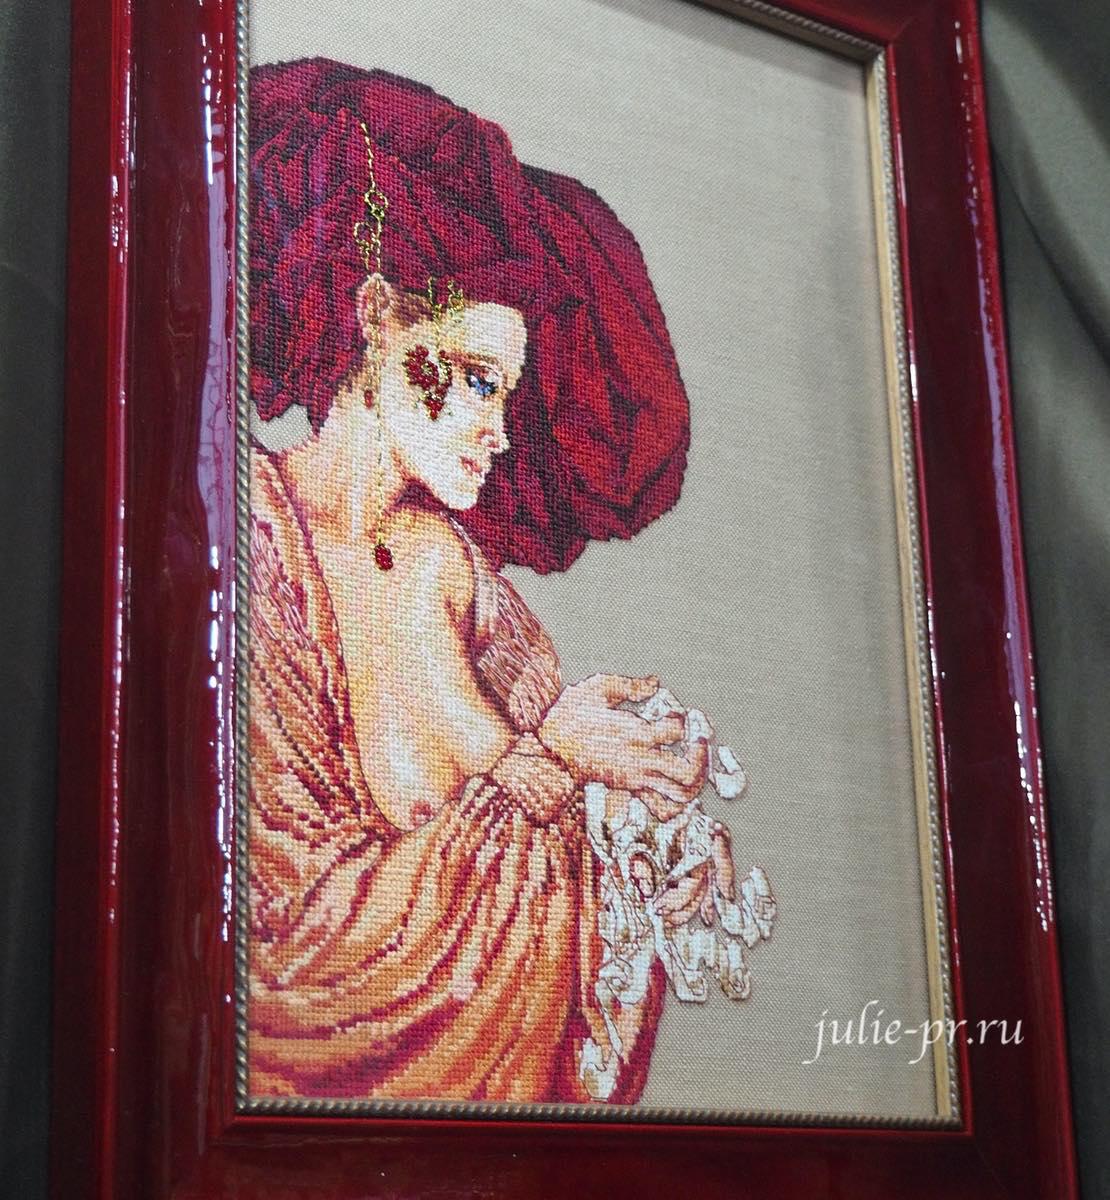 Nimue, Archives, Архив, красная шапочка, вышивка крестом